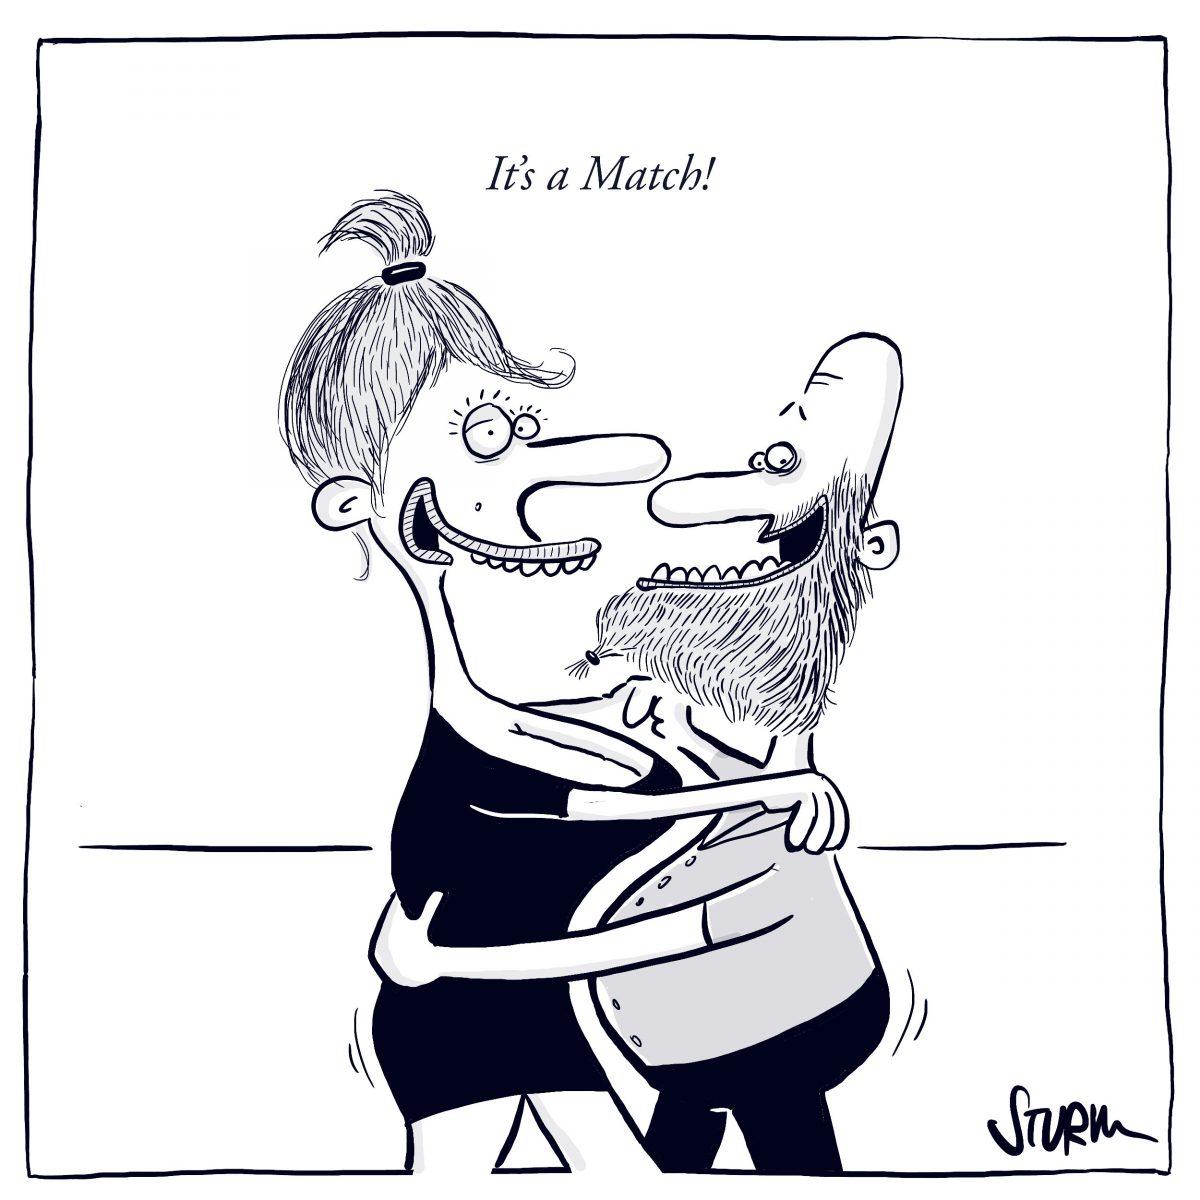 It's a Match – Cartoon von Philipp Sturm